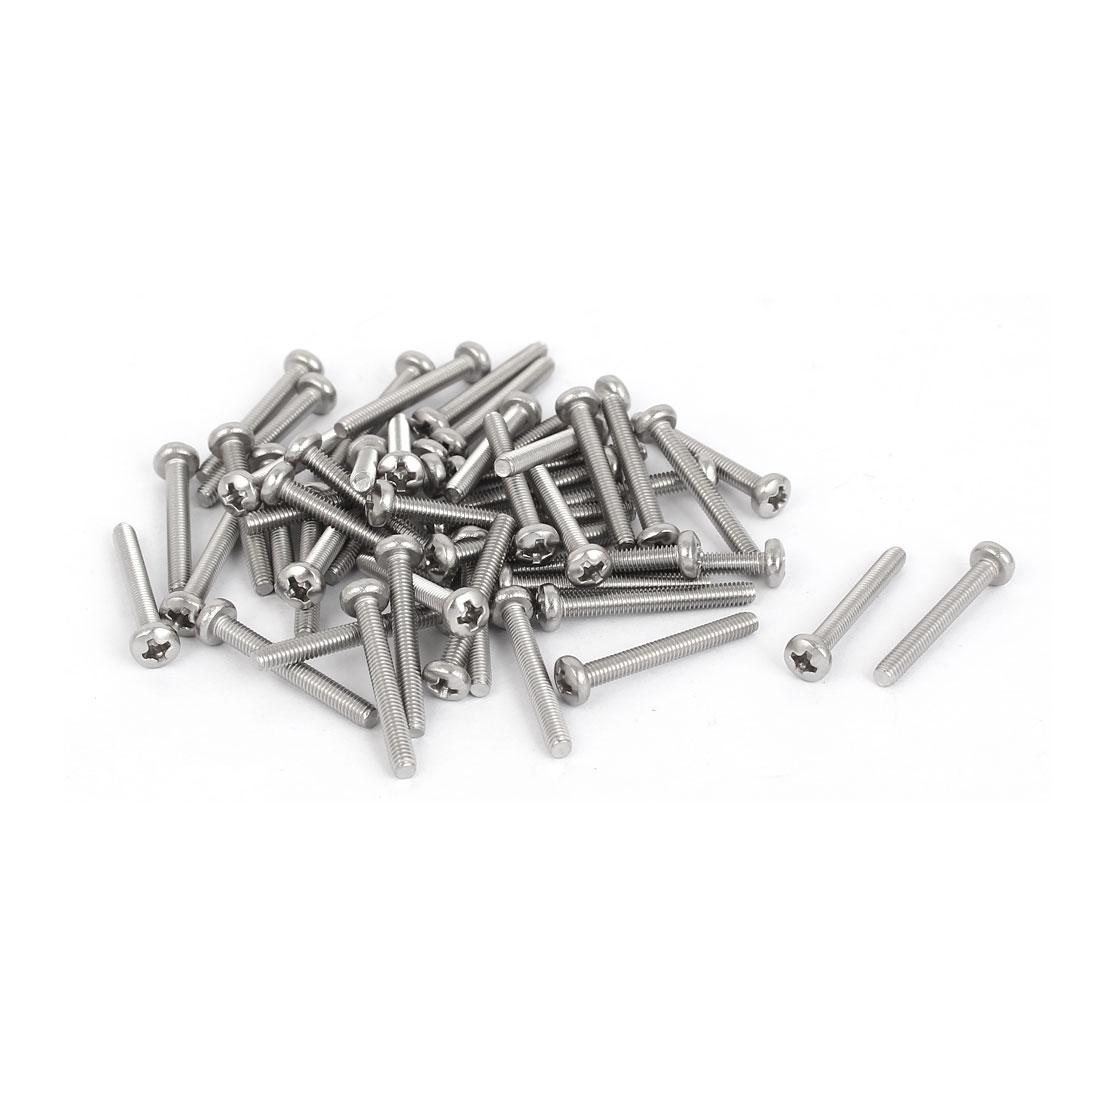 50 Pcs M2.5x20mm 316 Stainless Steel Phillips Pan Head Machine Screws Fasteners